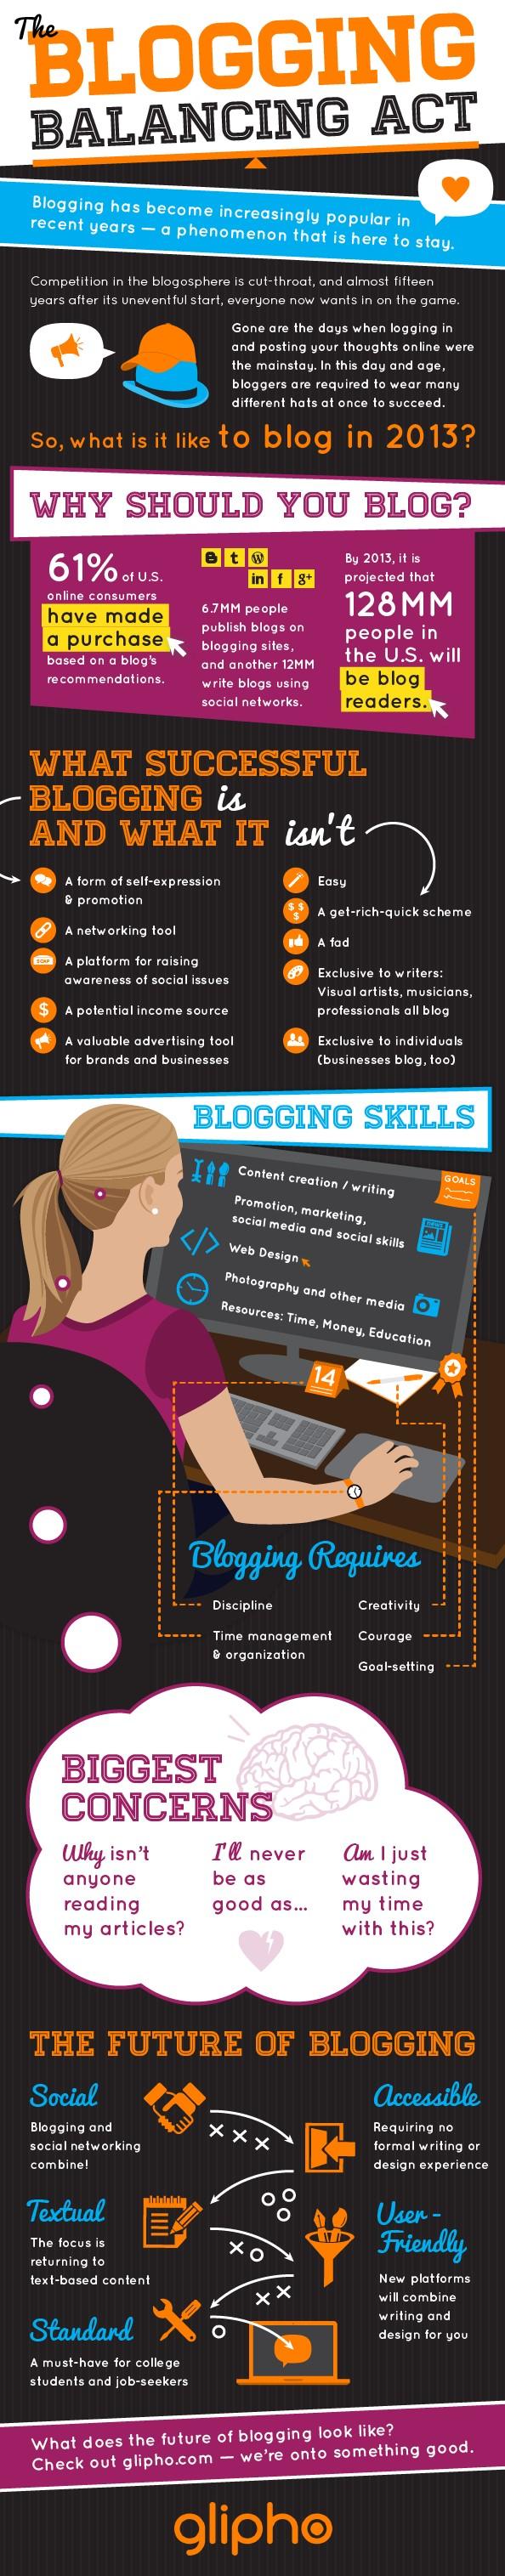 Blogging balancing act